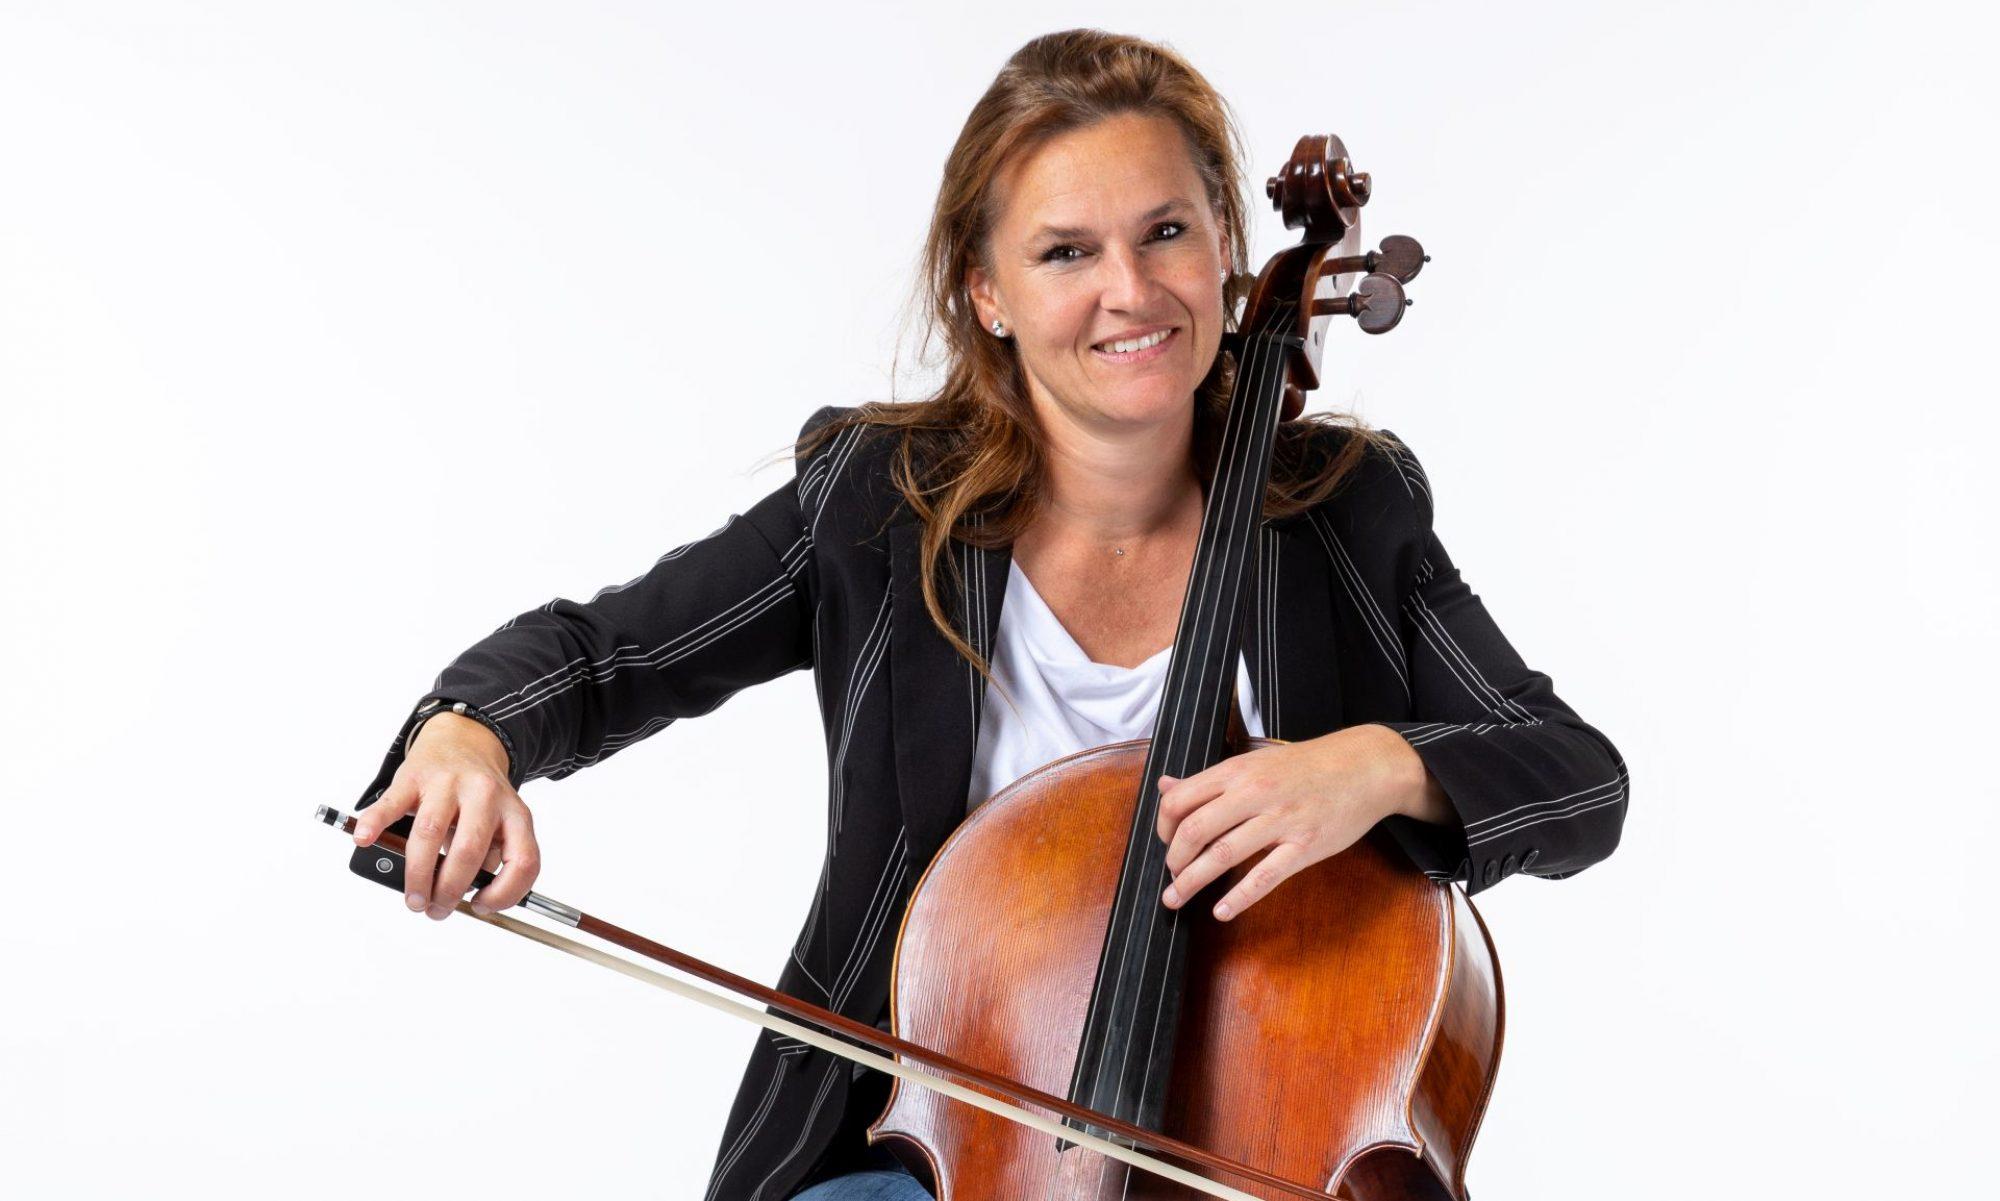 Julia Klaushofer